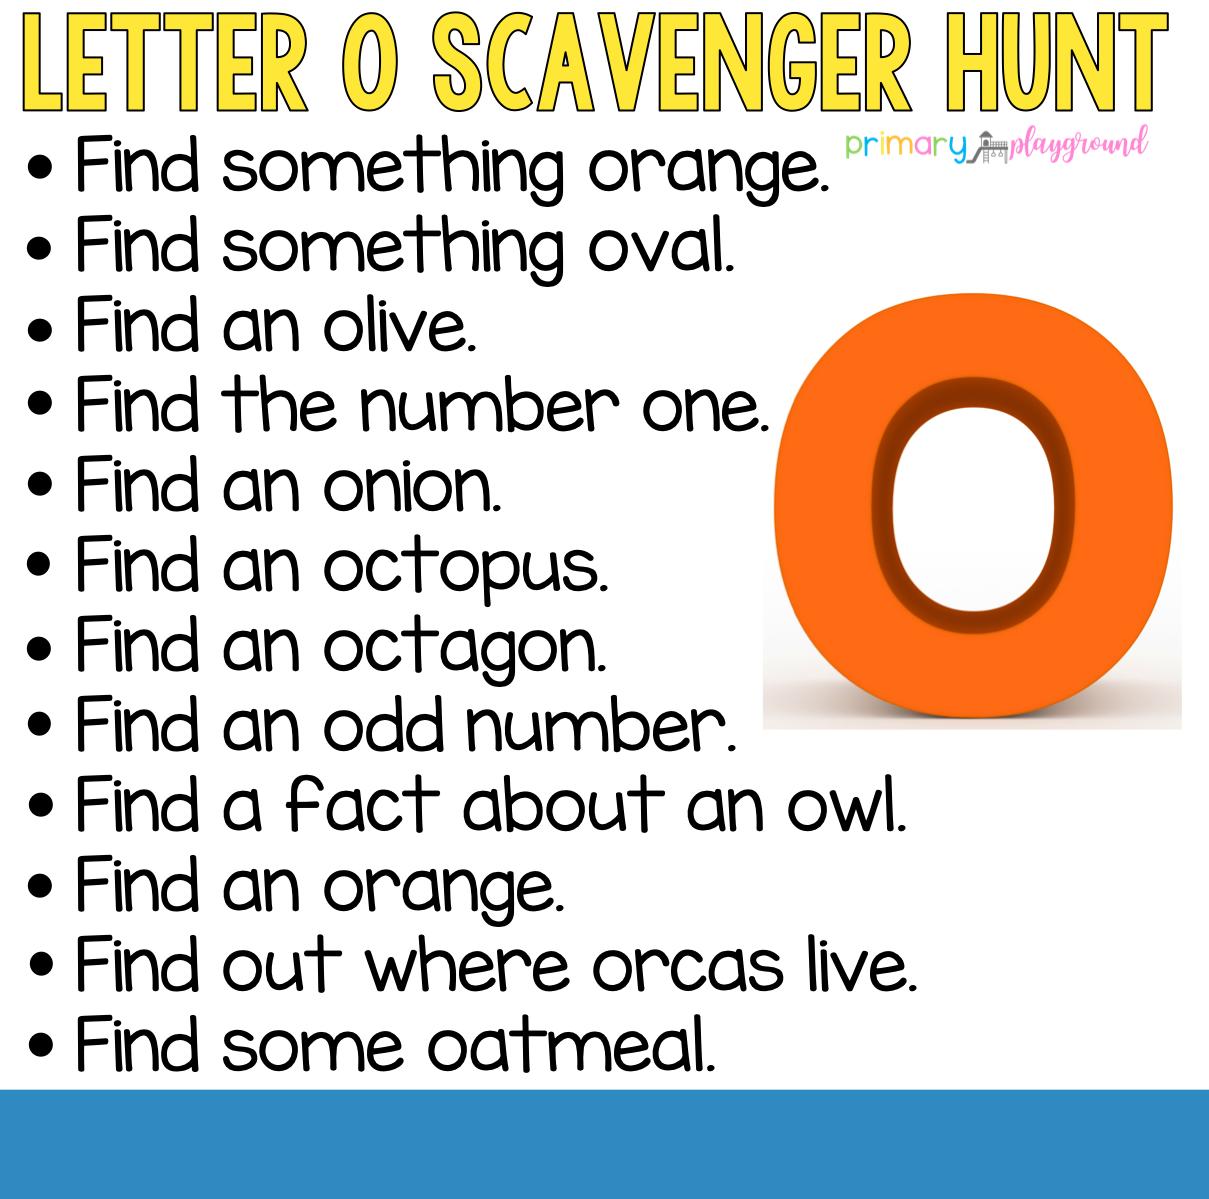 Alphabet Scavenger Hunts Primary Playground Preschool Letters Letter O Letter O Activities